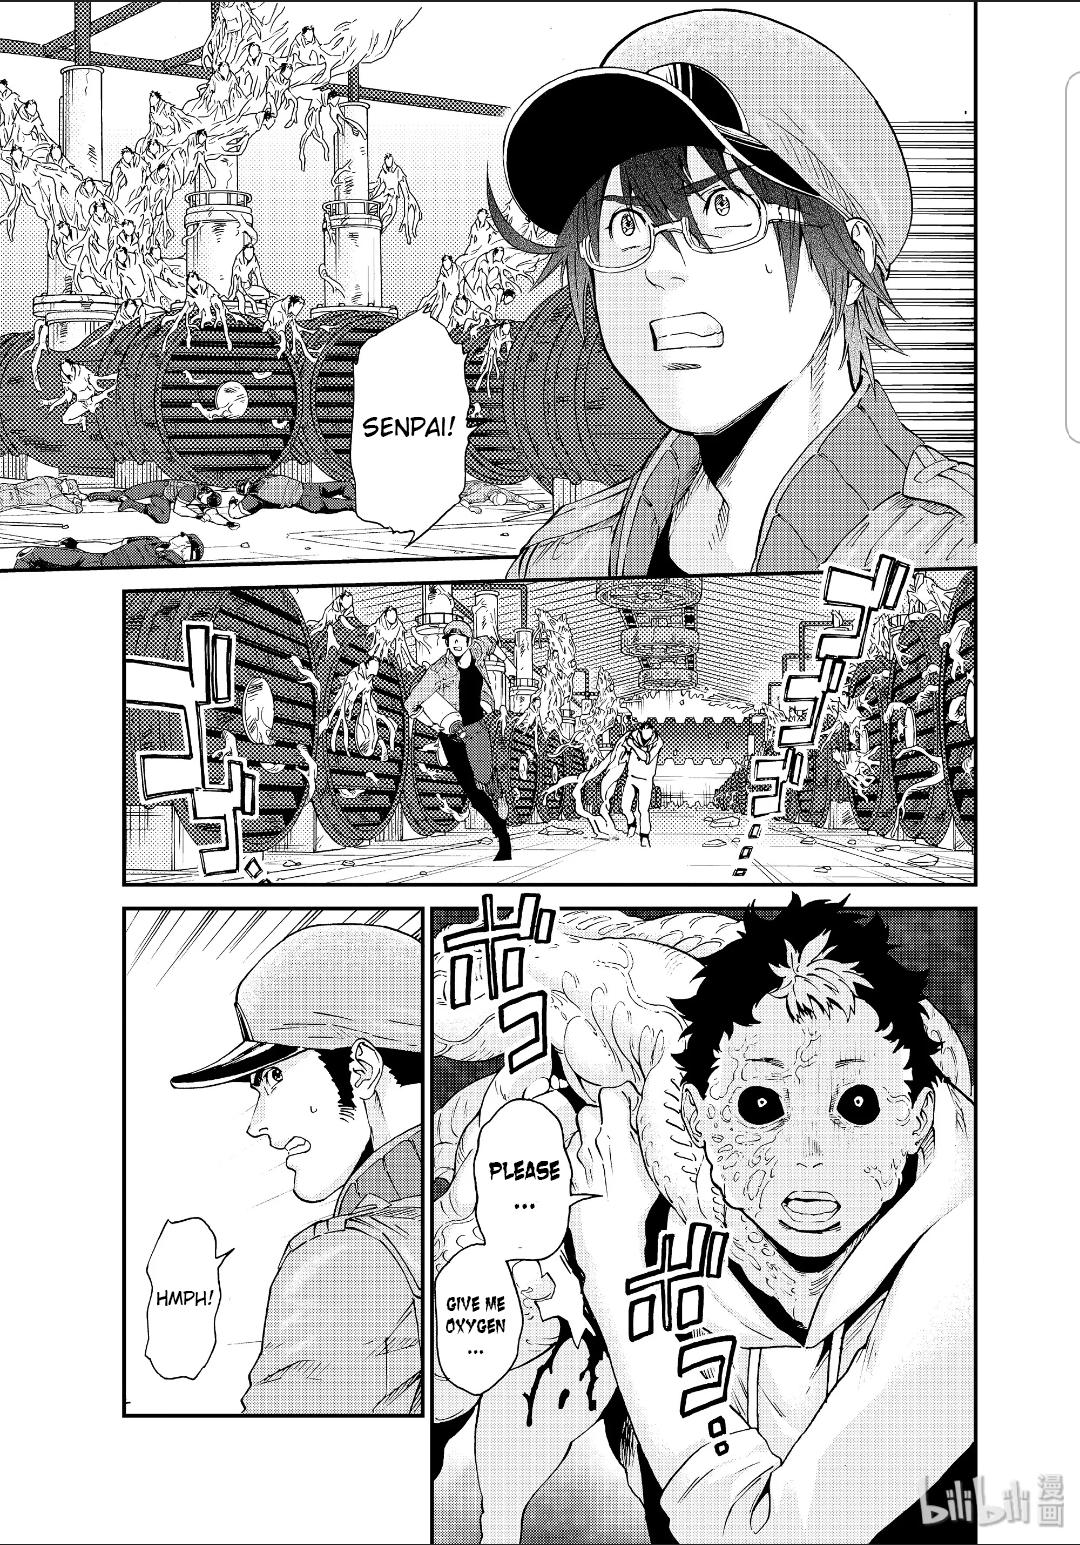 Hataraku Saibou Black Vol.7 Chapter 39 page 5 - Mangakakalots.com